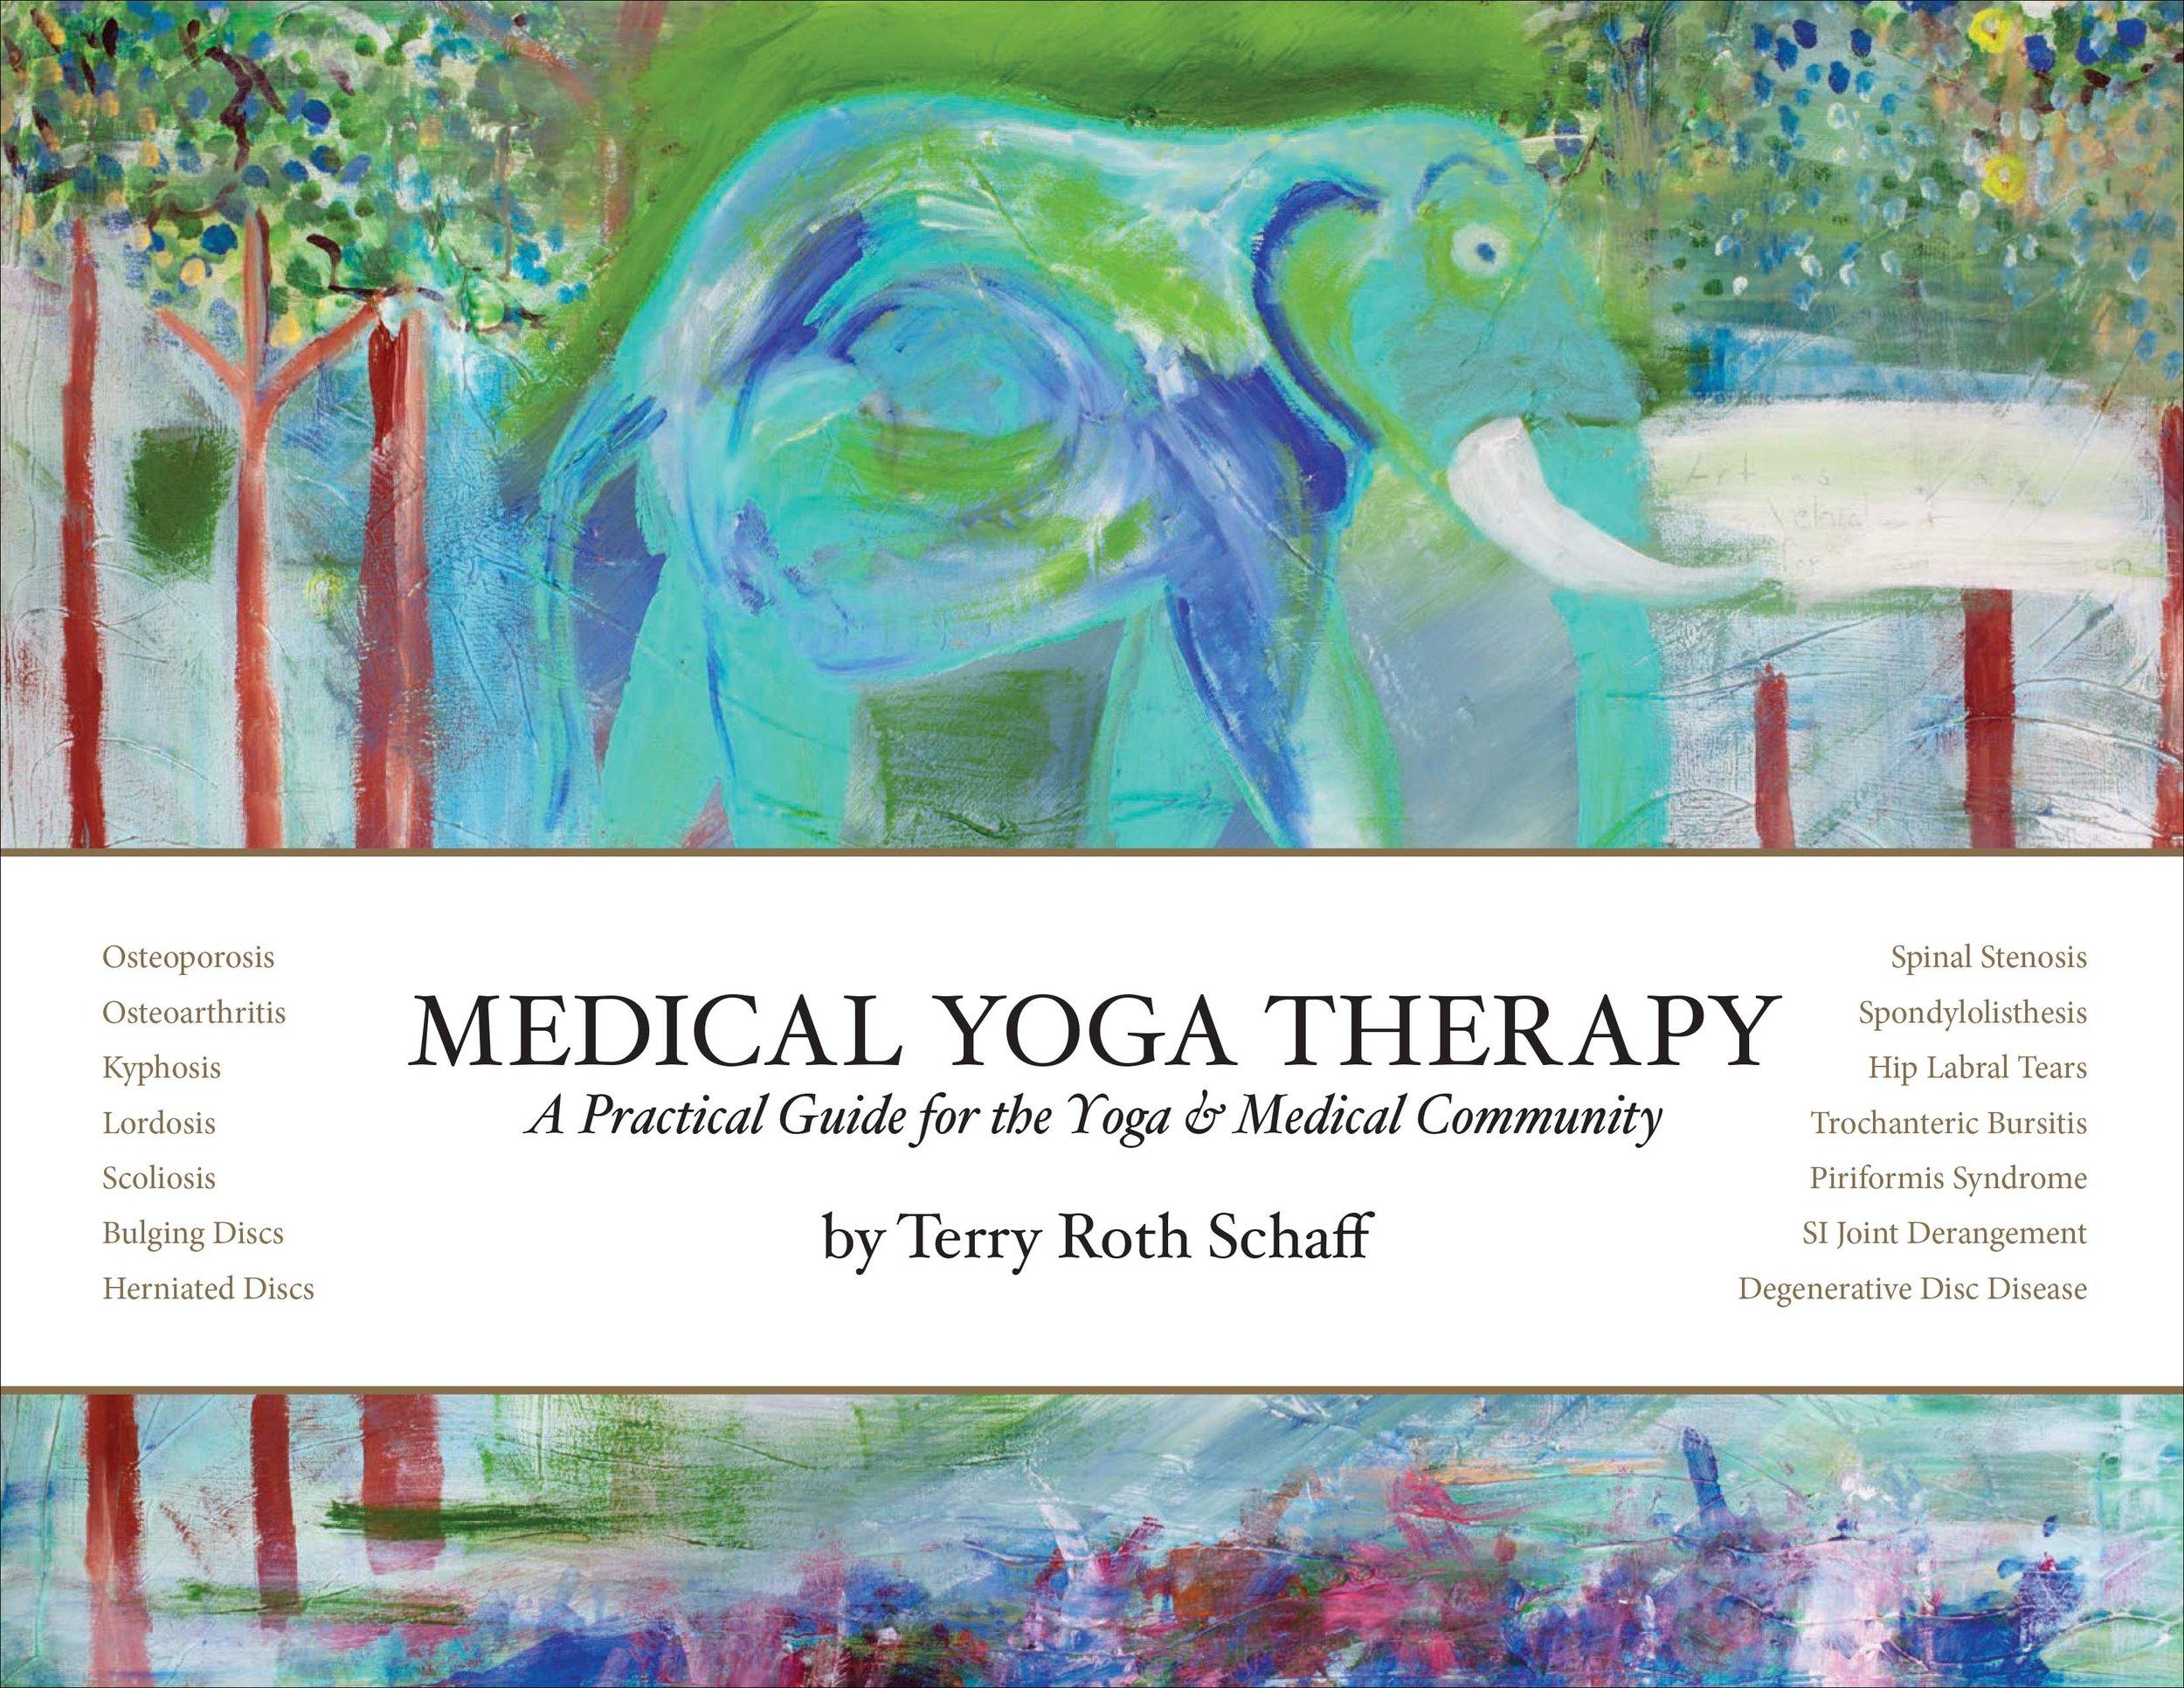 _MedicalYogaTherapyBook_TerrySchaff_BookCover copy.jpg